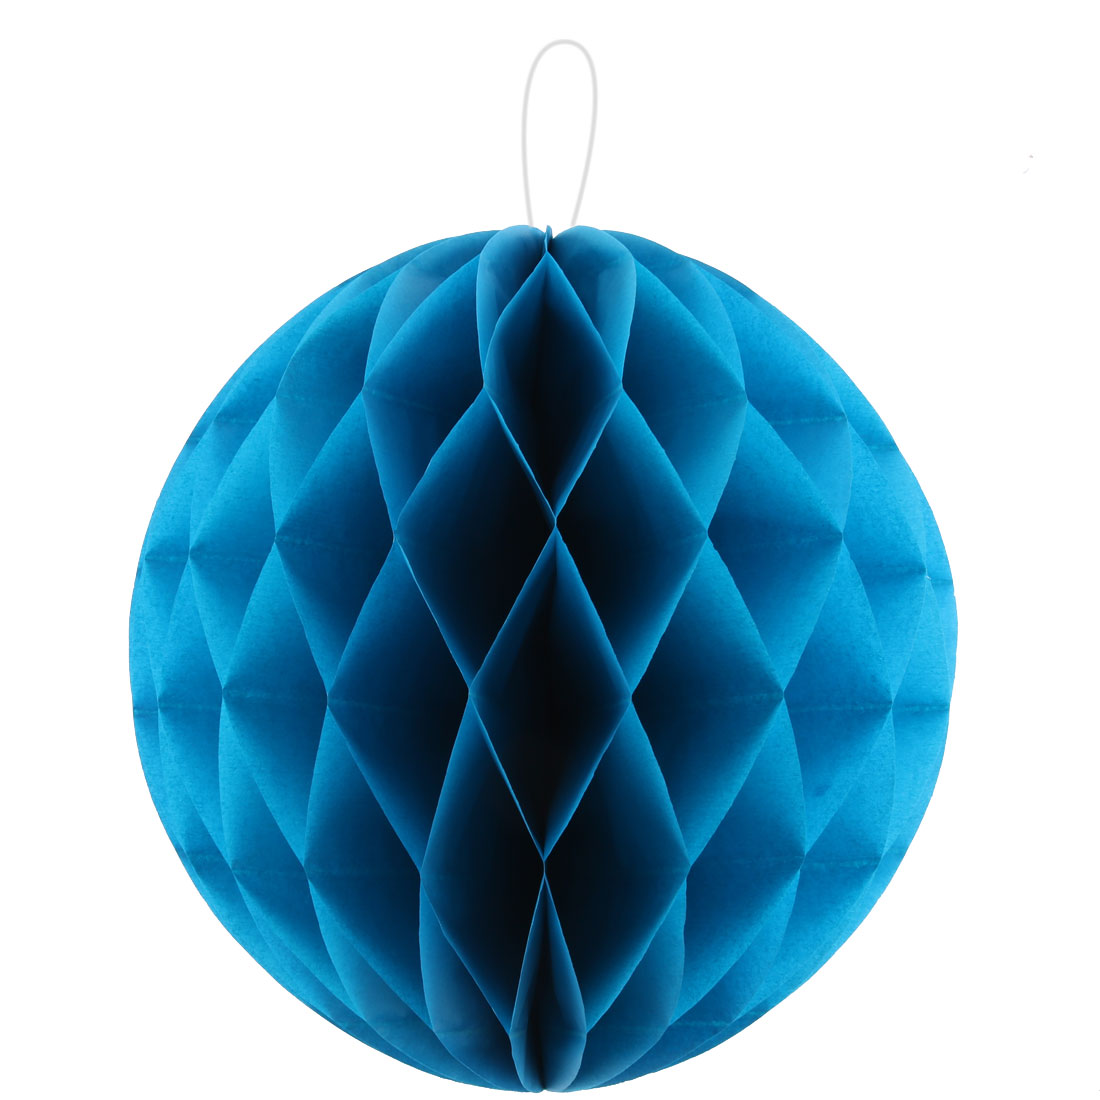 Paper Foldable DIY String Hanging Lantern Lamp Decor Honeycomb Ball Blue 12 Inch Dia